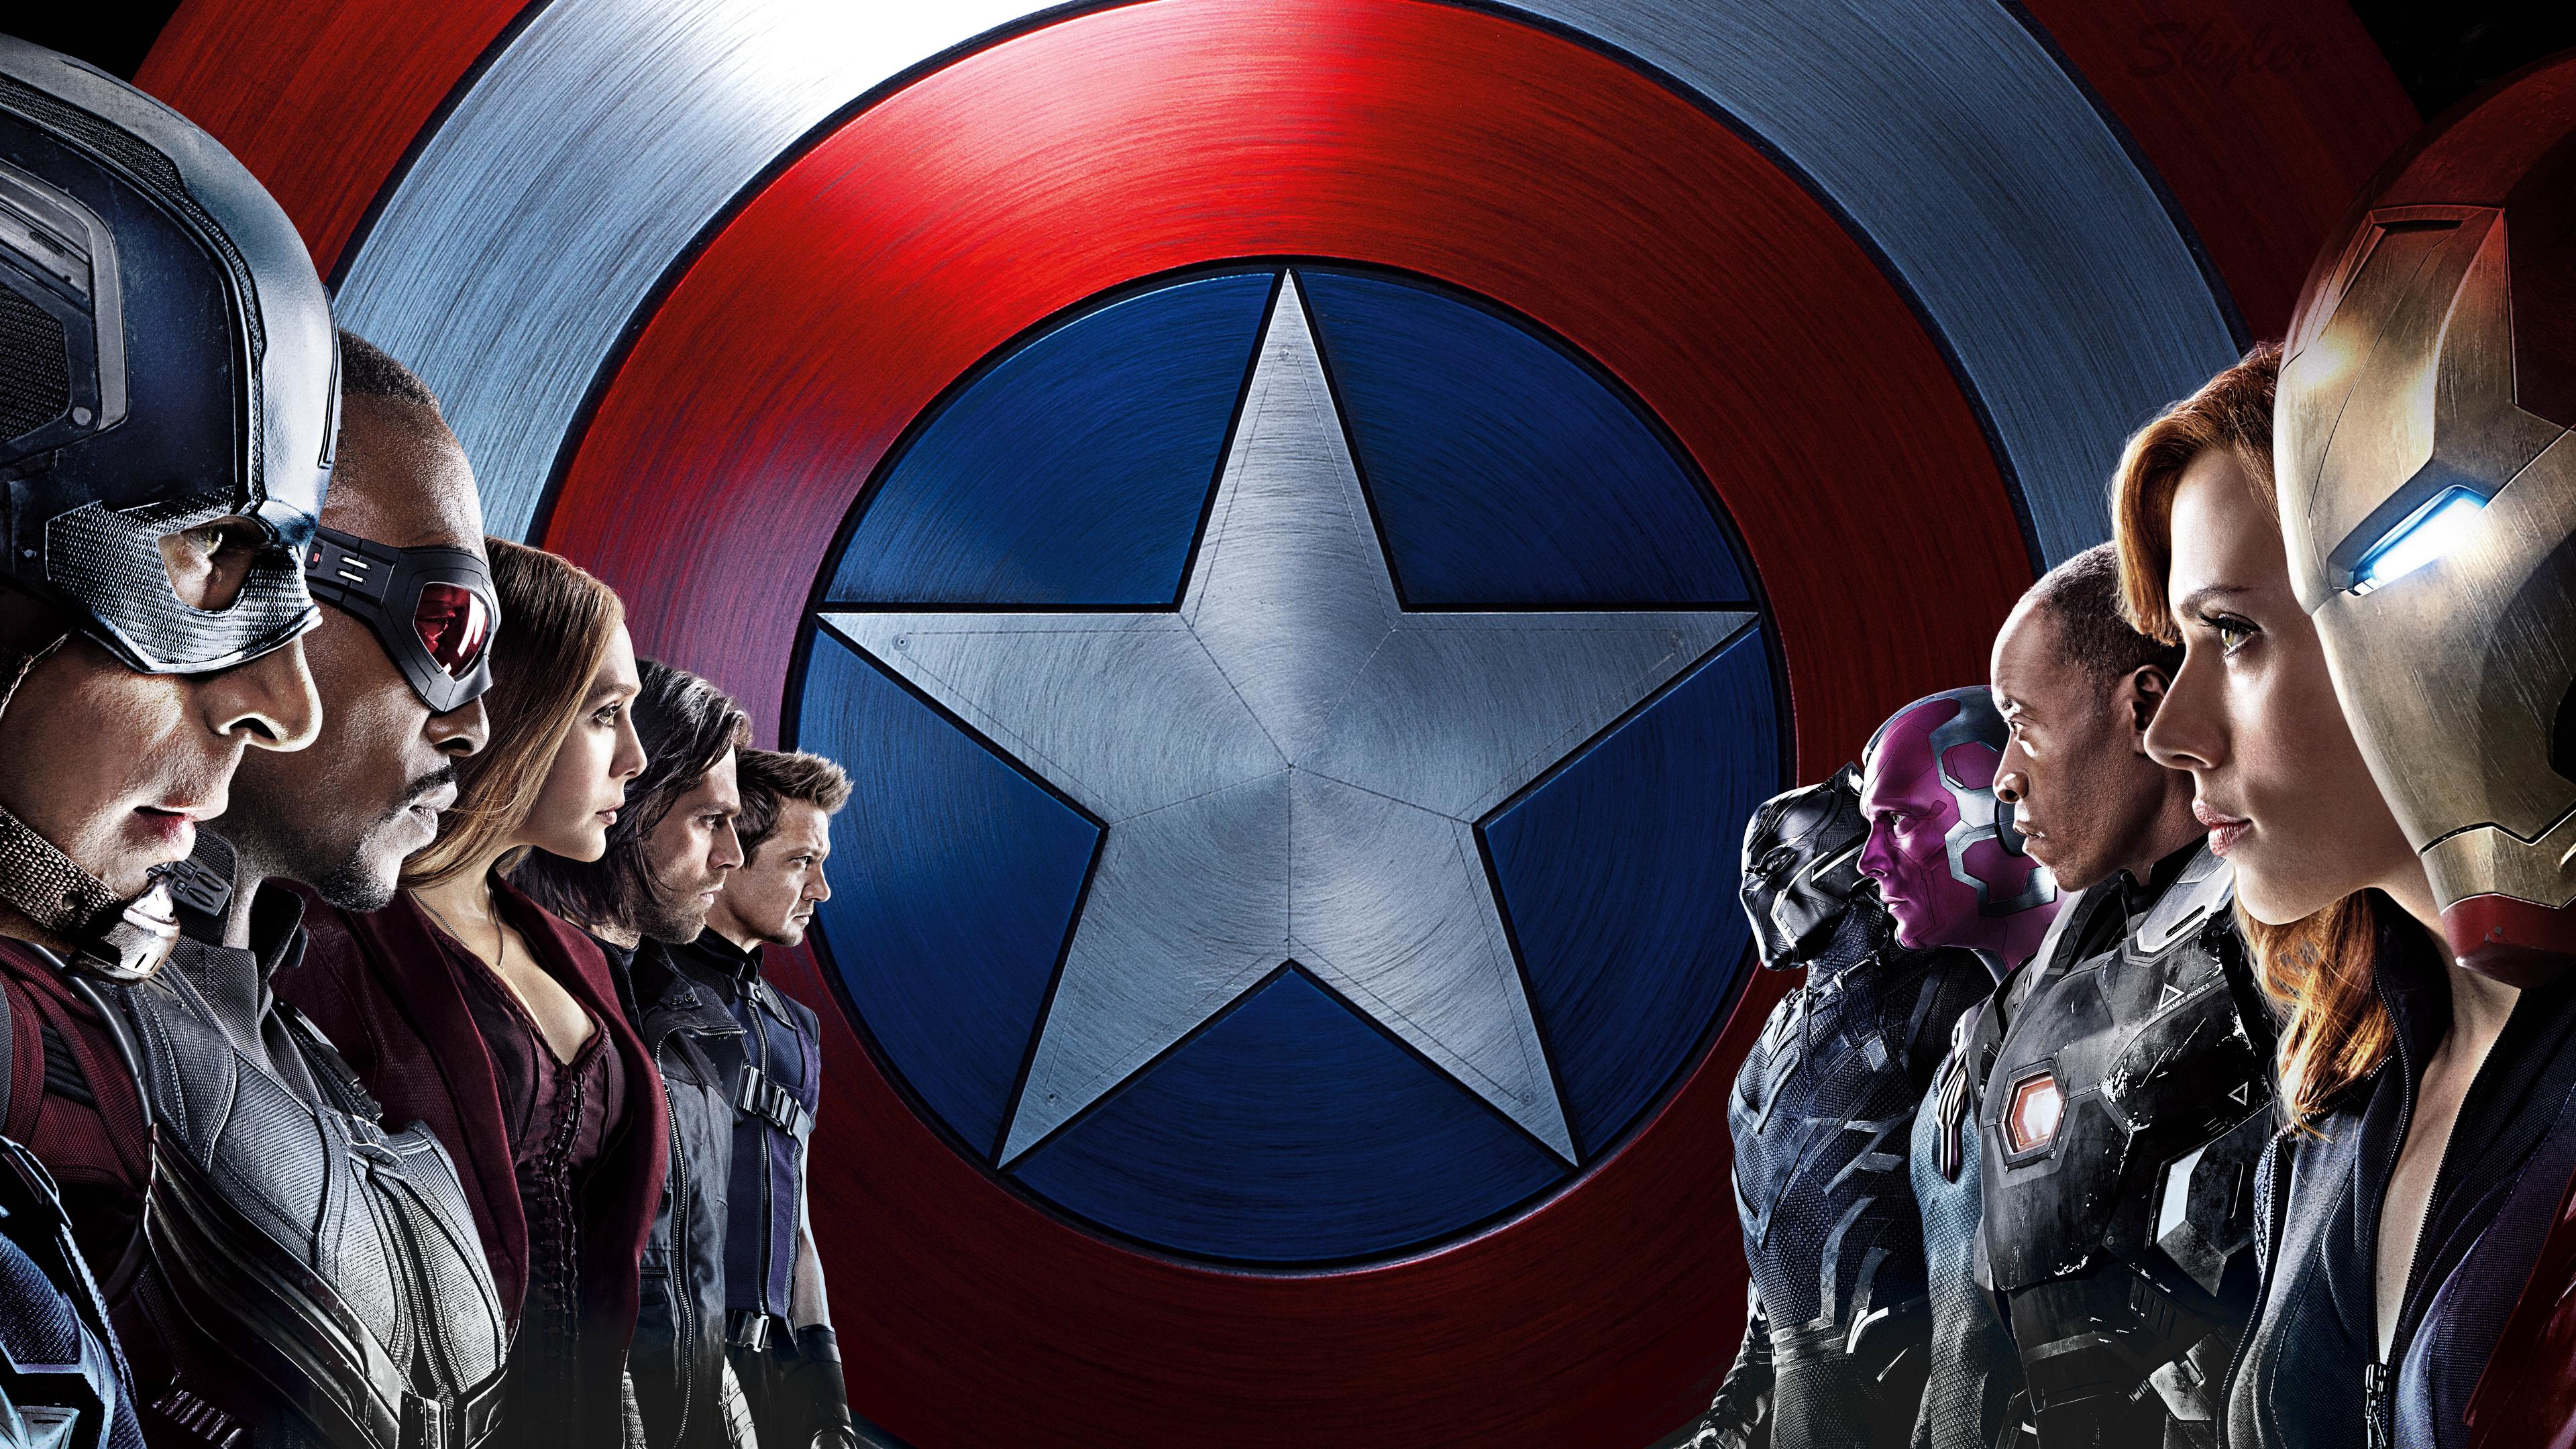 captain america civil war 4k 1541969695 - Captain America Civil War 4k - movies wallpapers, hd-wallpapers, captain america civil war wallpapers, 4k-wallpapers